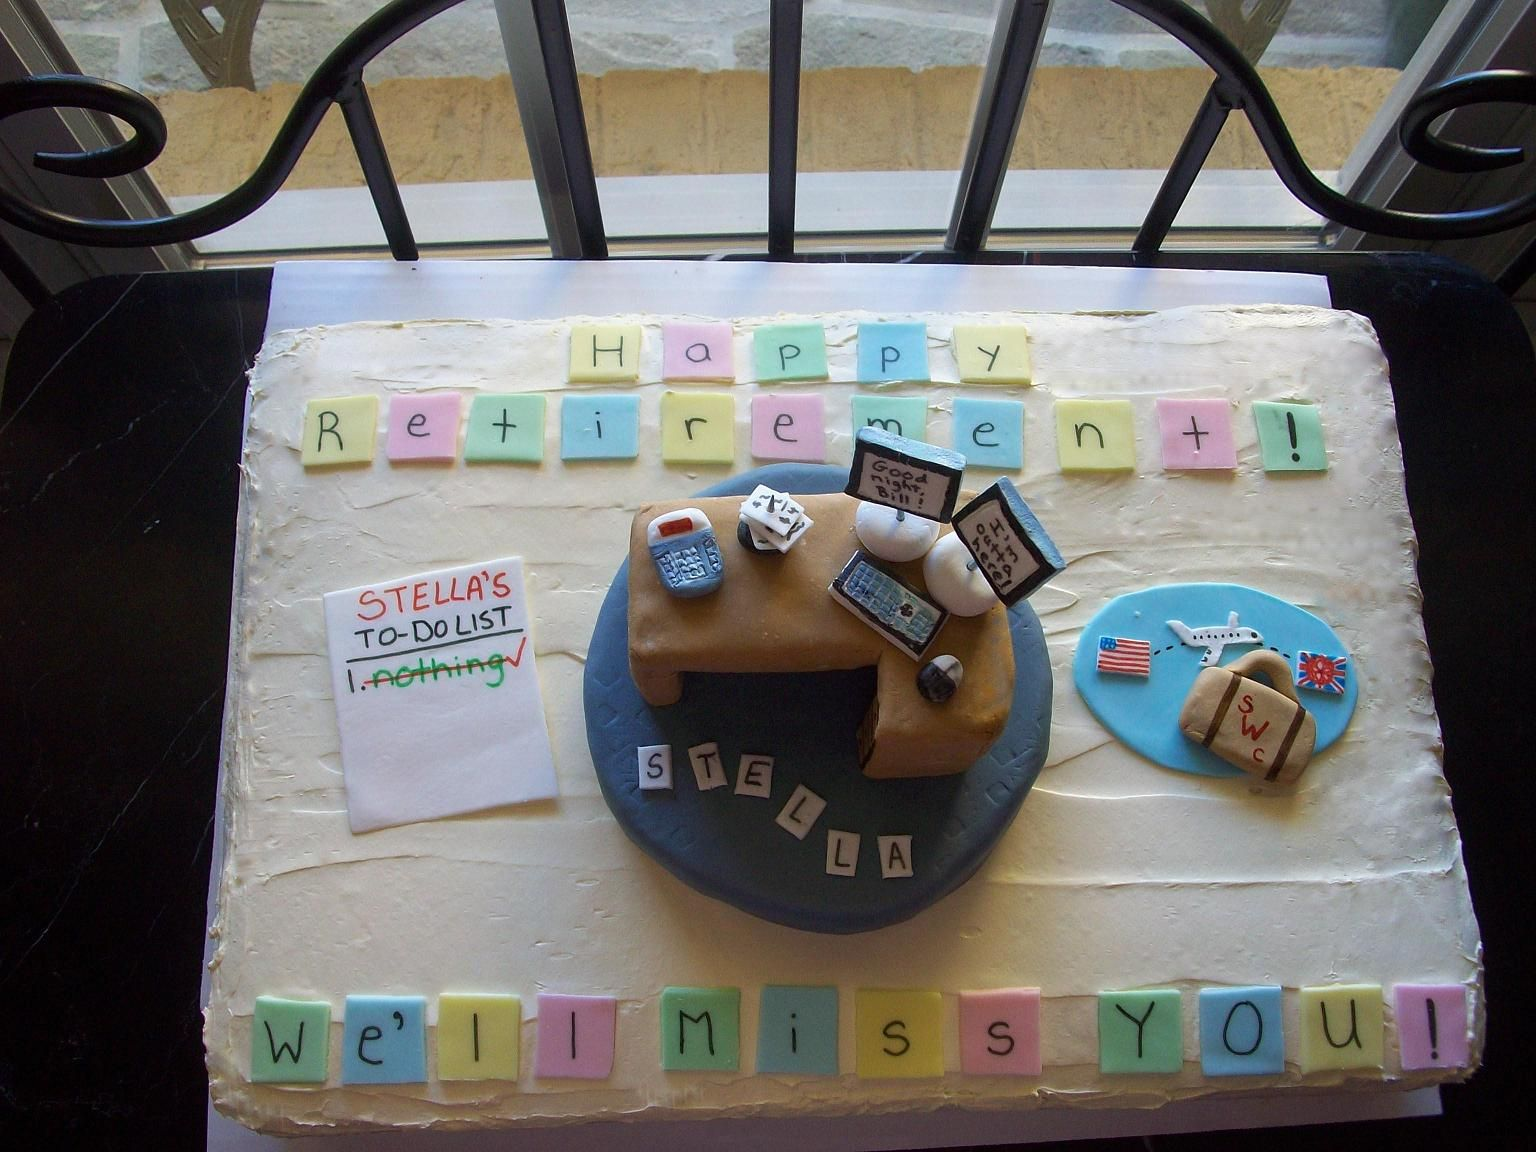 gp office retirement cake fondant to do list desk computer gp office retirement cake fondant to do list desk computer monitor calculator